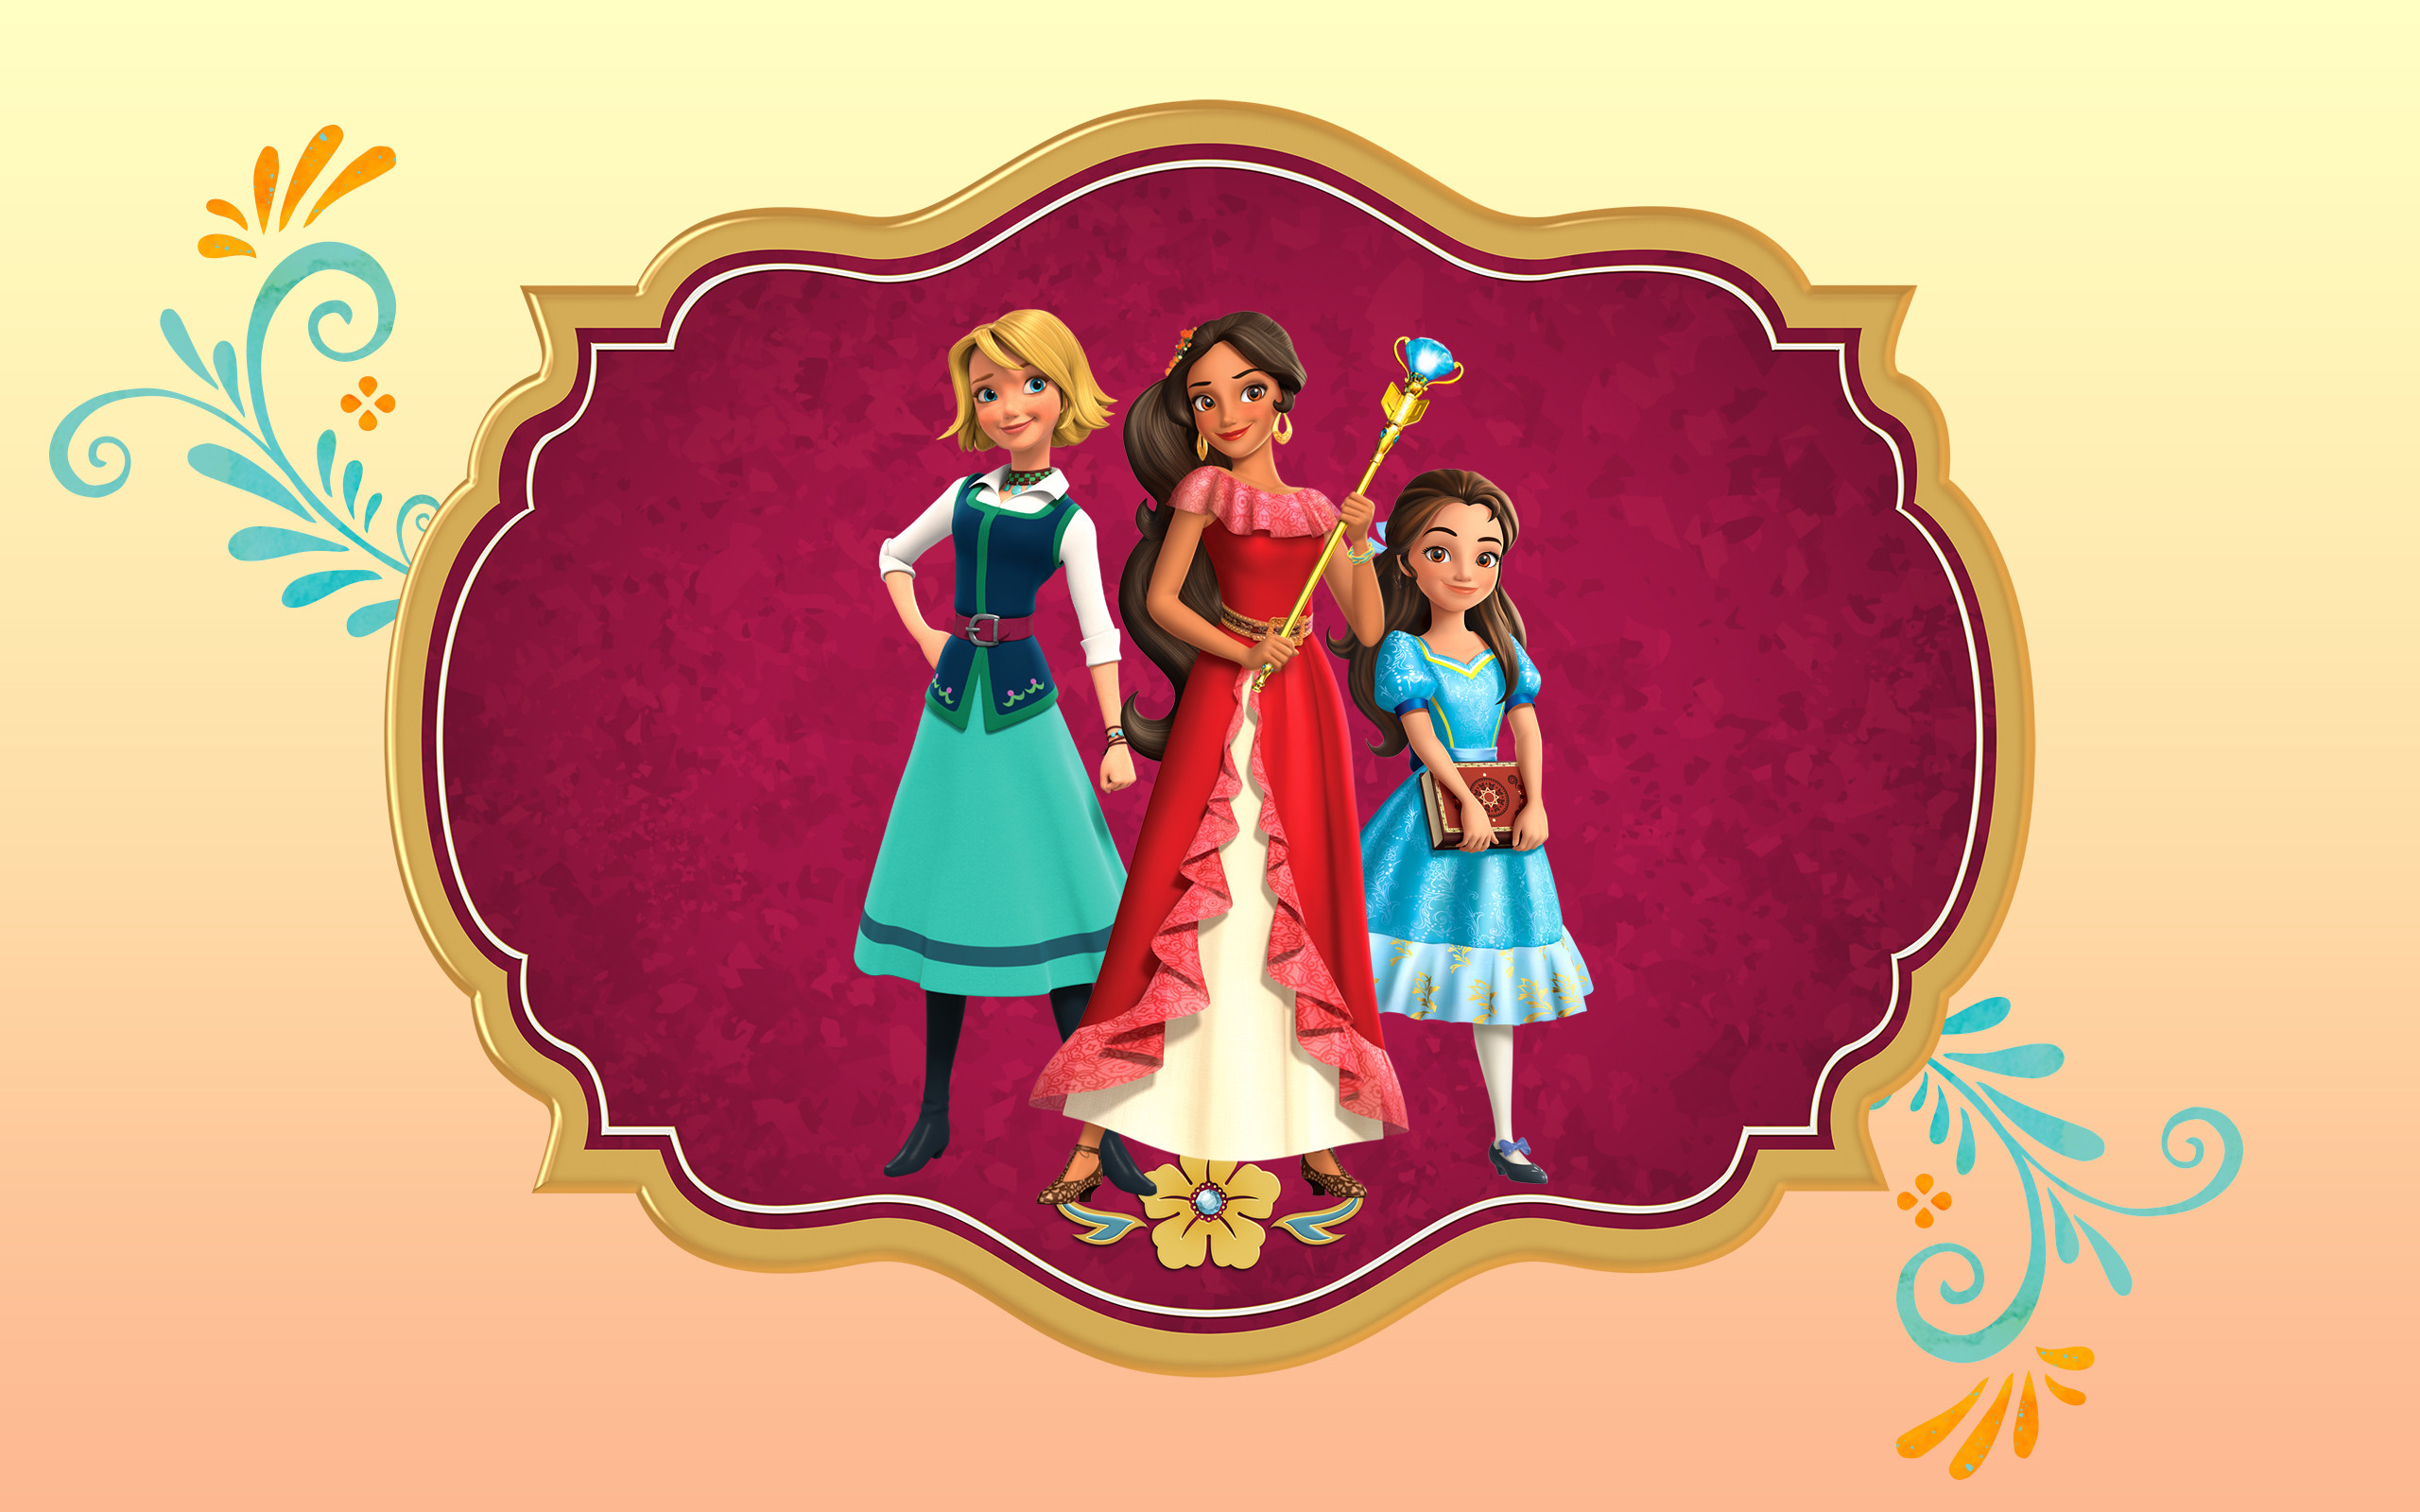 Res: 2560x1600, Elena of Avalor big wallpaper with princess Elena, isabel and Naomi